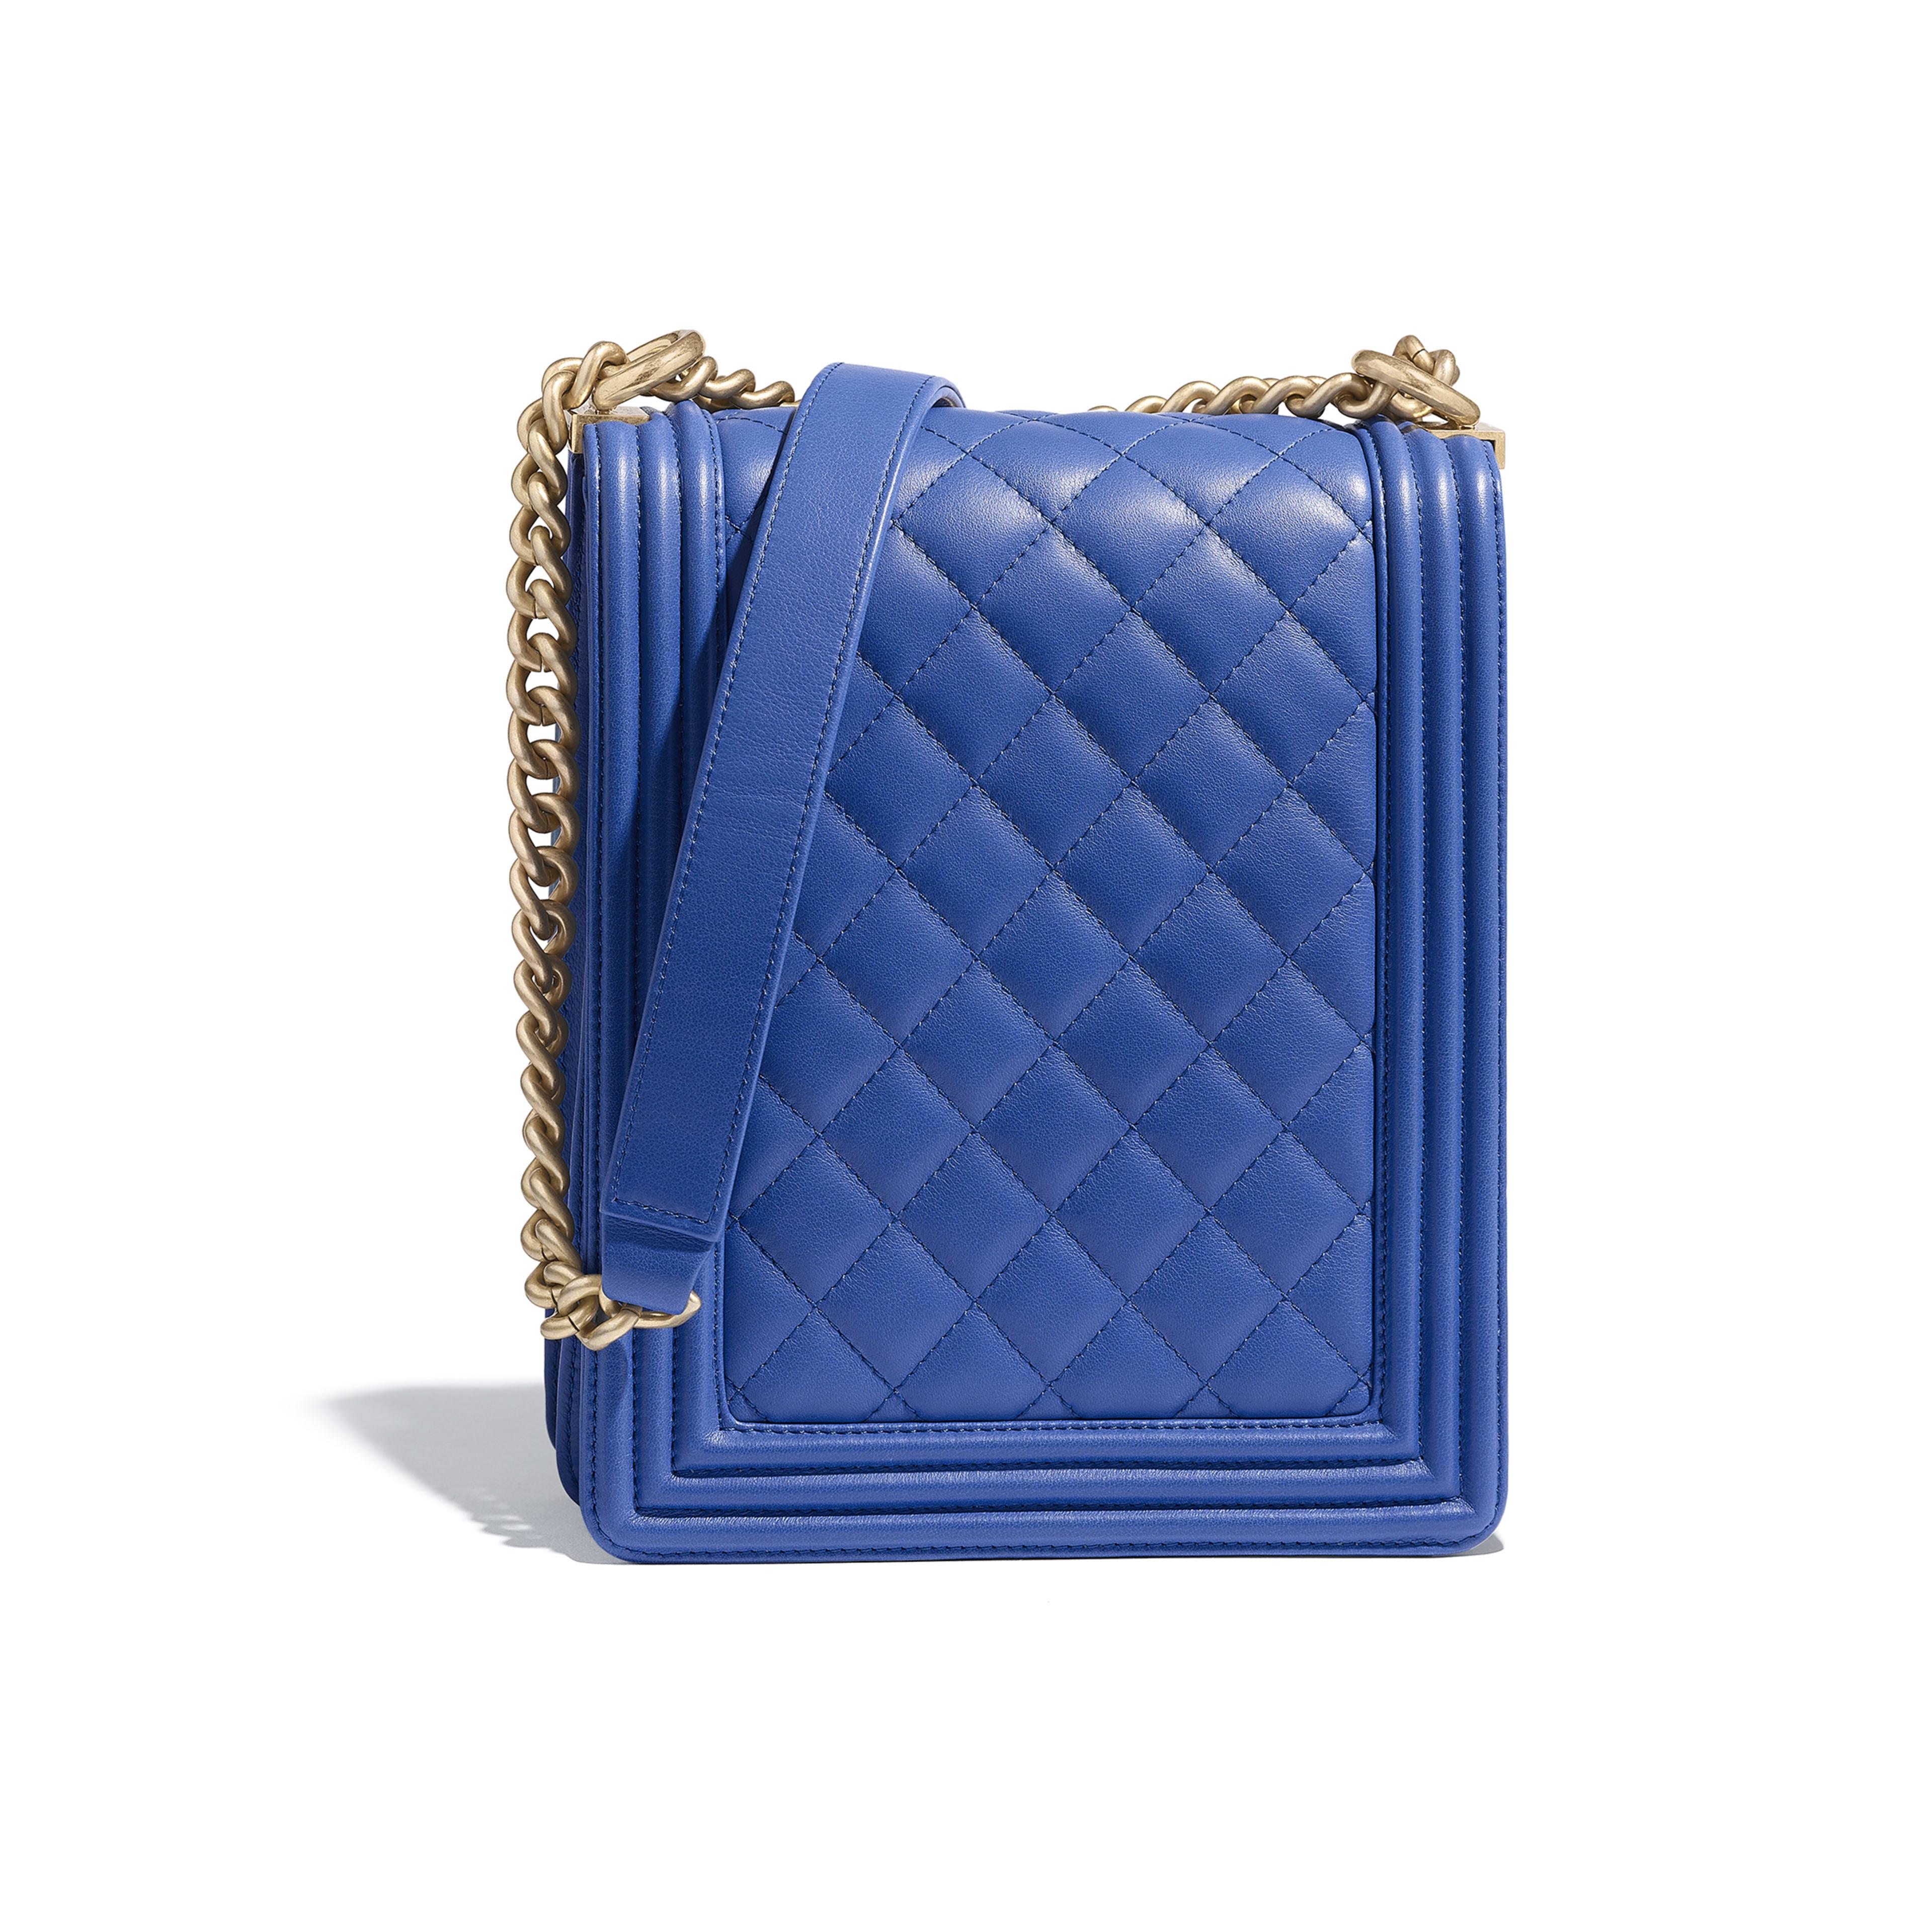 f695b872133d68 Boy Chanel Handbag Calfskin & Gold-tone Metal | Stanford Center for ...